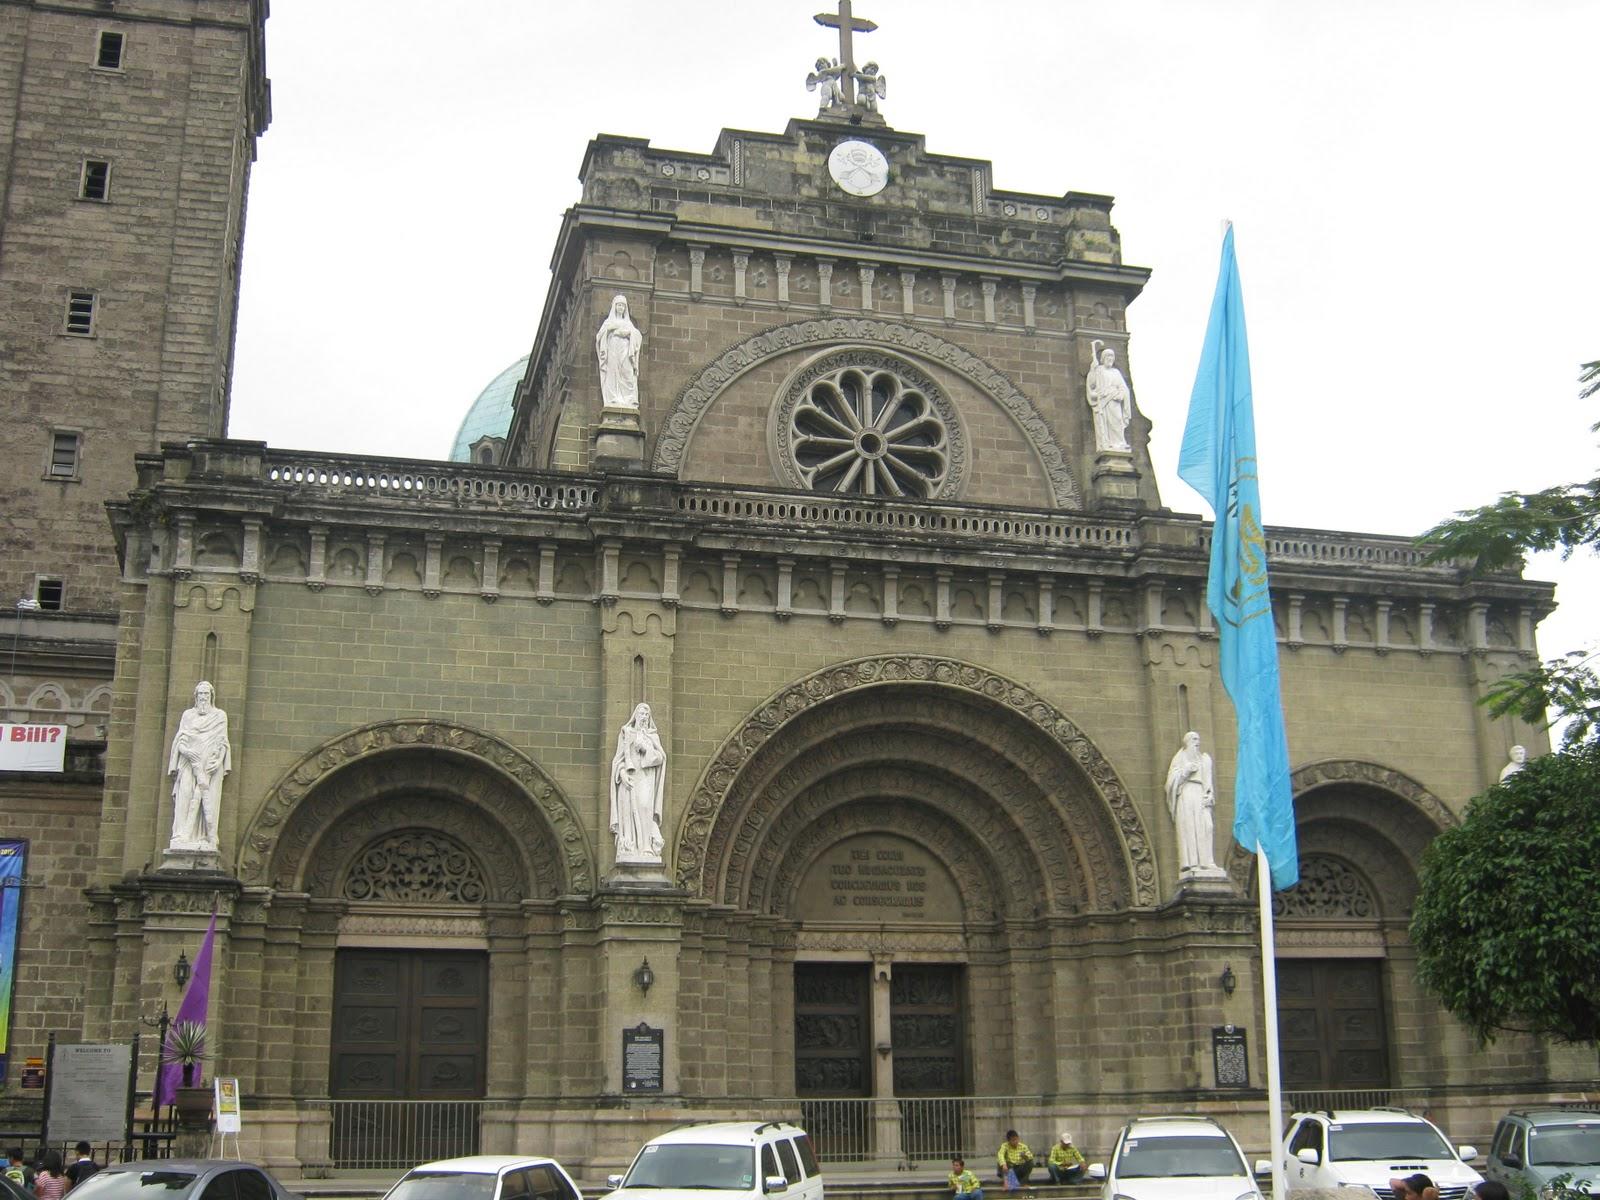 Architecture Romanesque